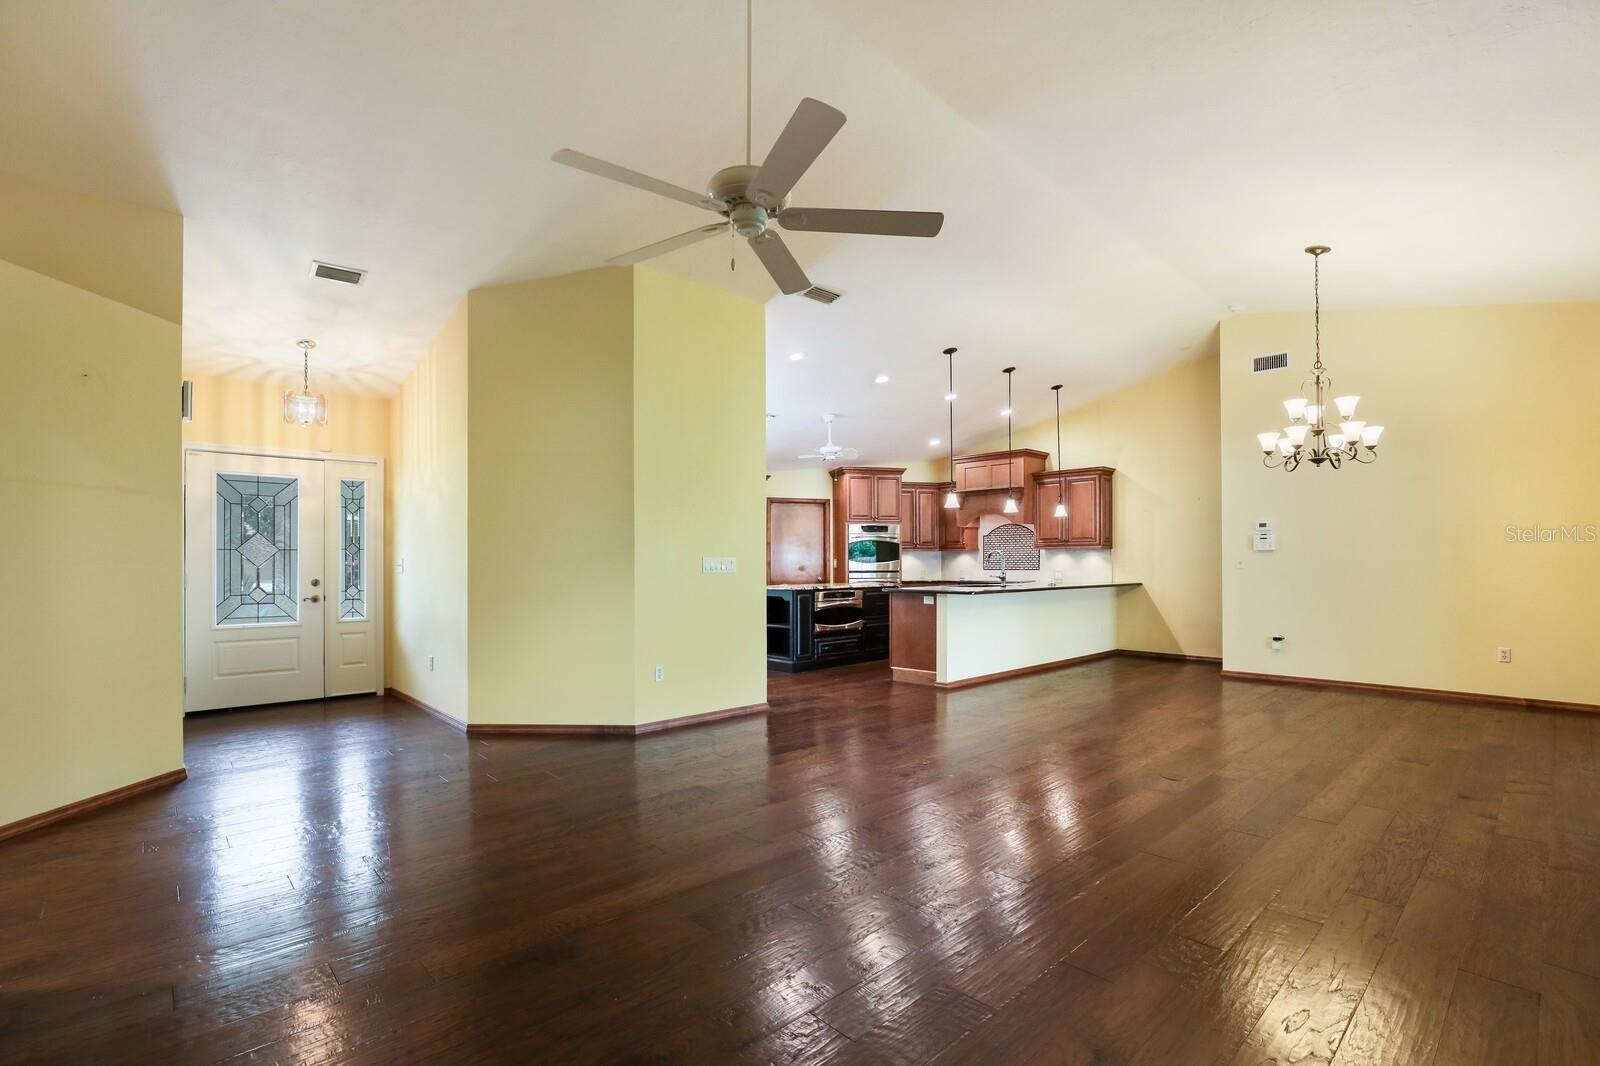 Photo of 908 72ND STREET NW, BRADENTON, FL 34209 (MLS # A4512816)